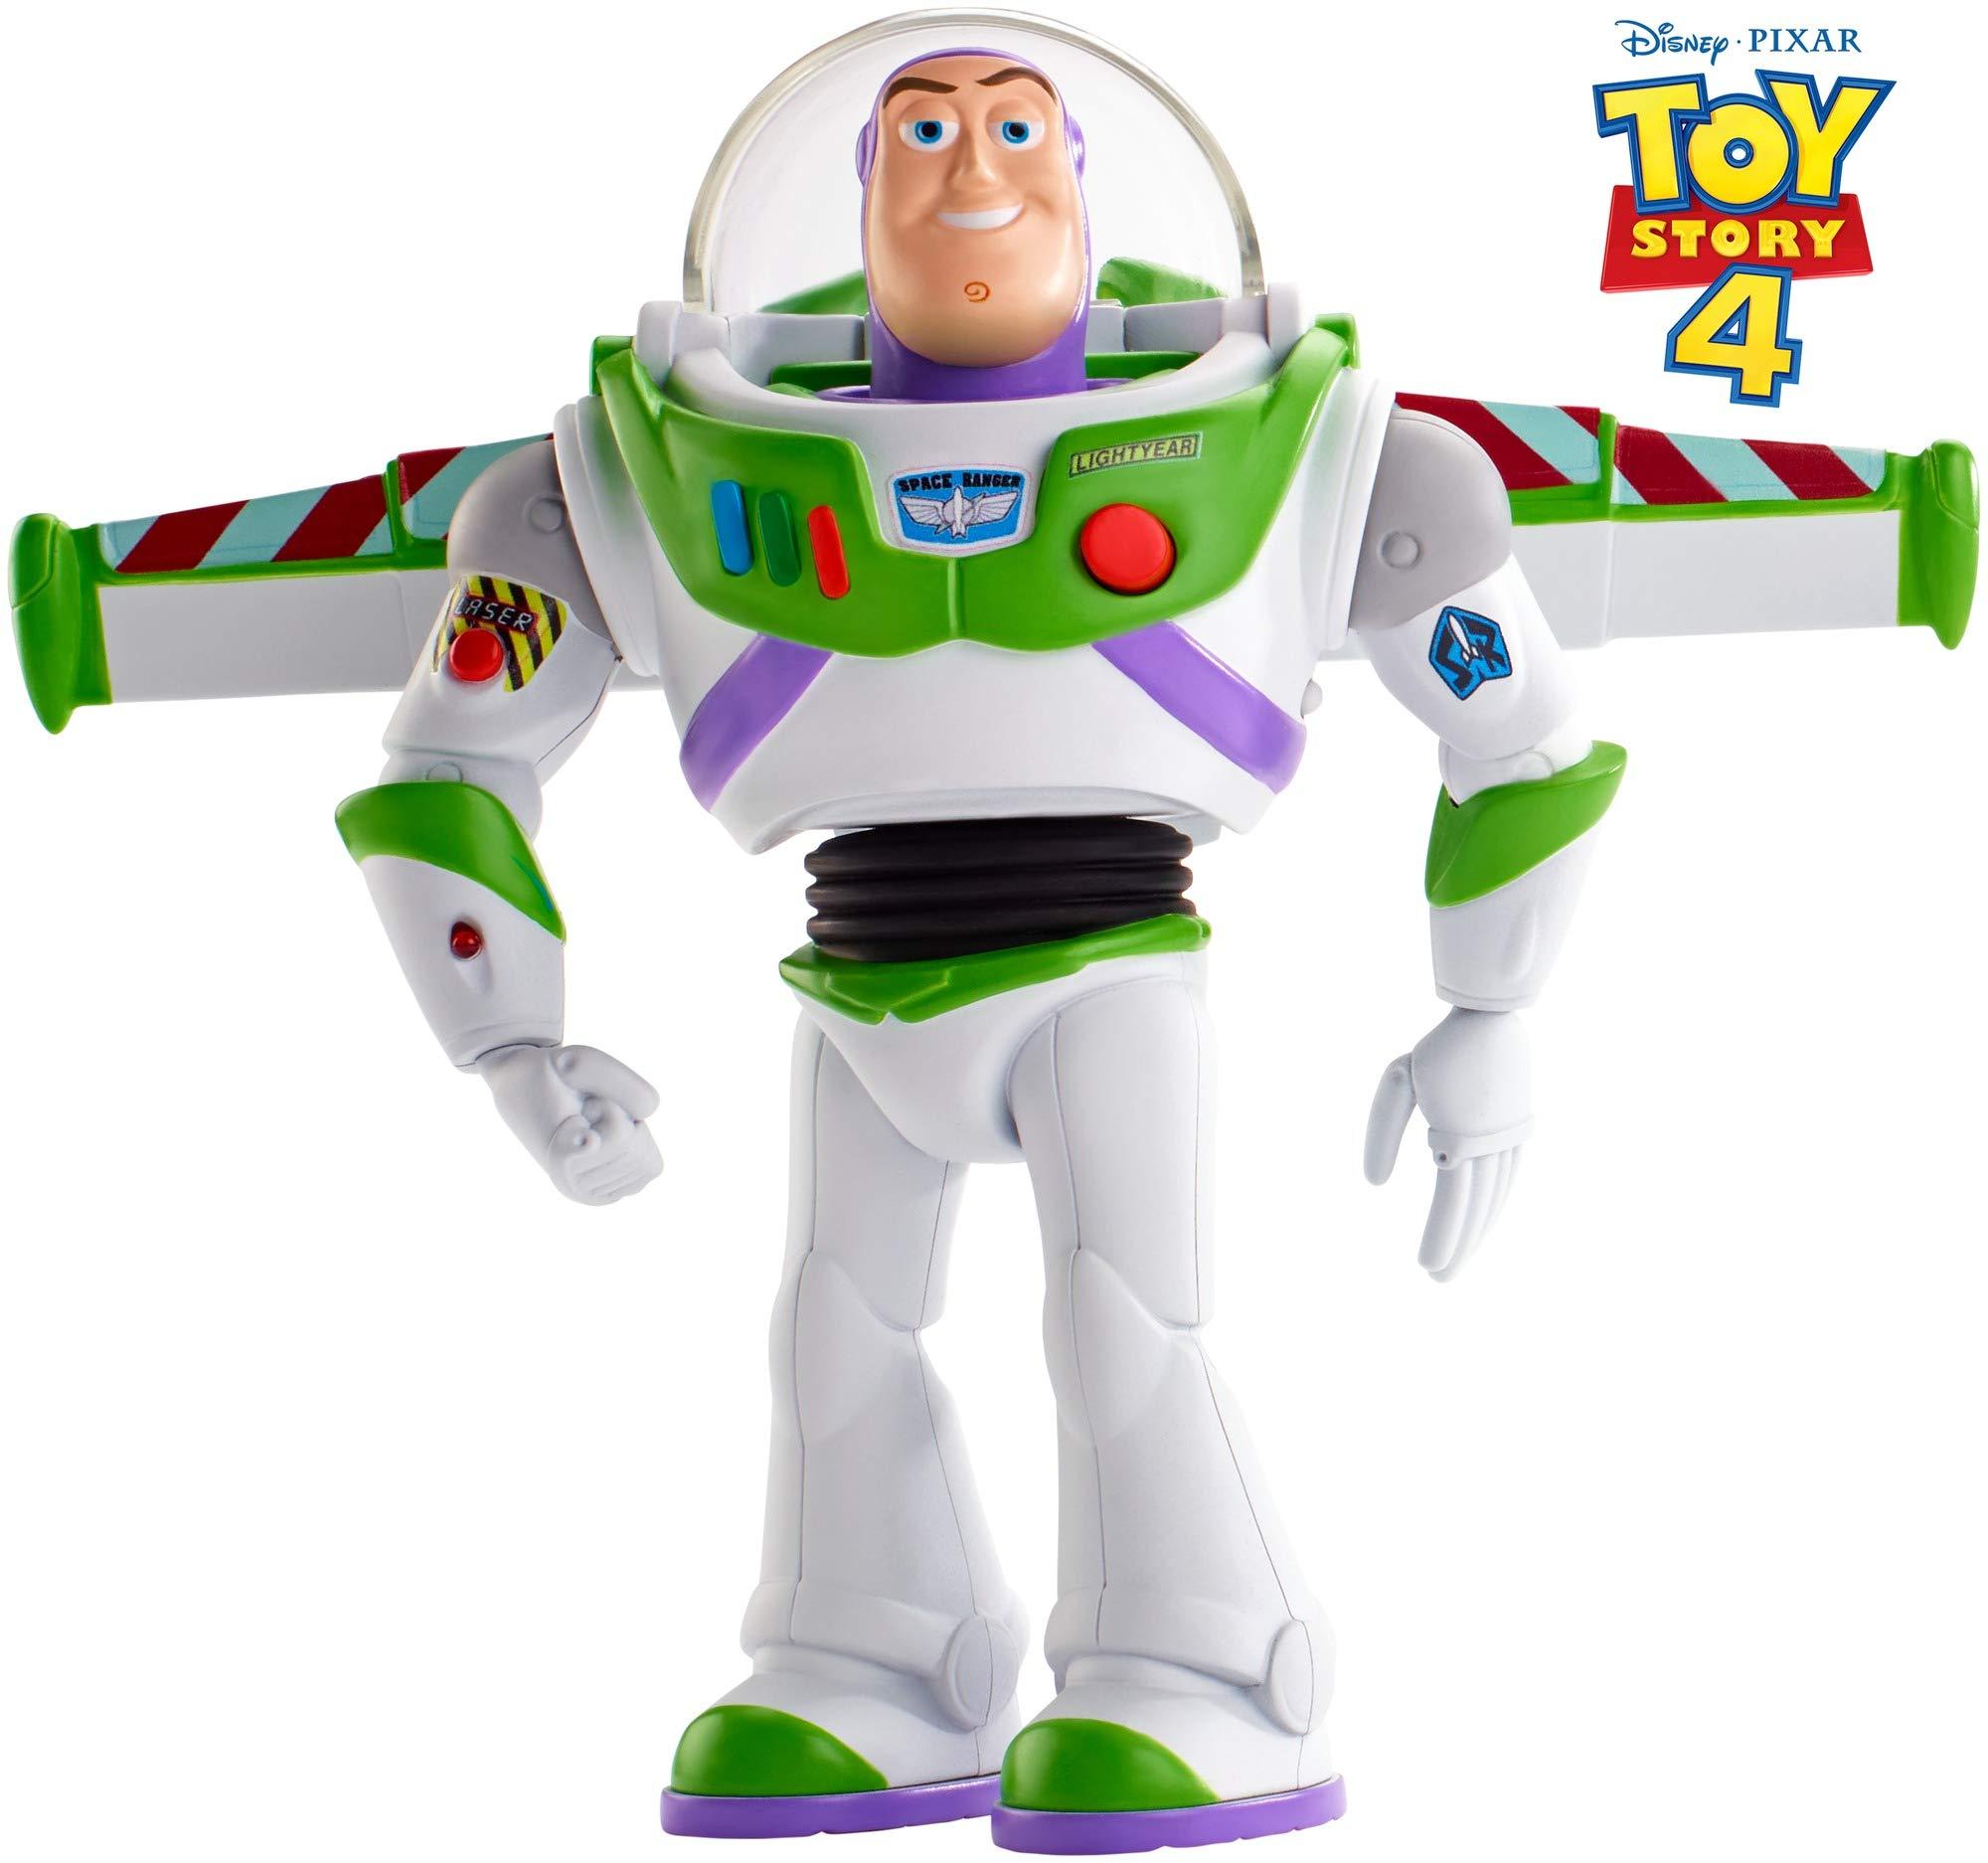 Disney Pixar Toy Story Ultimate Walking Buzz Lightyear, 7''